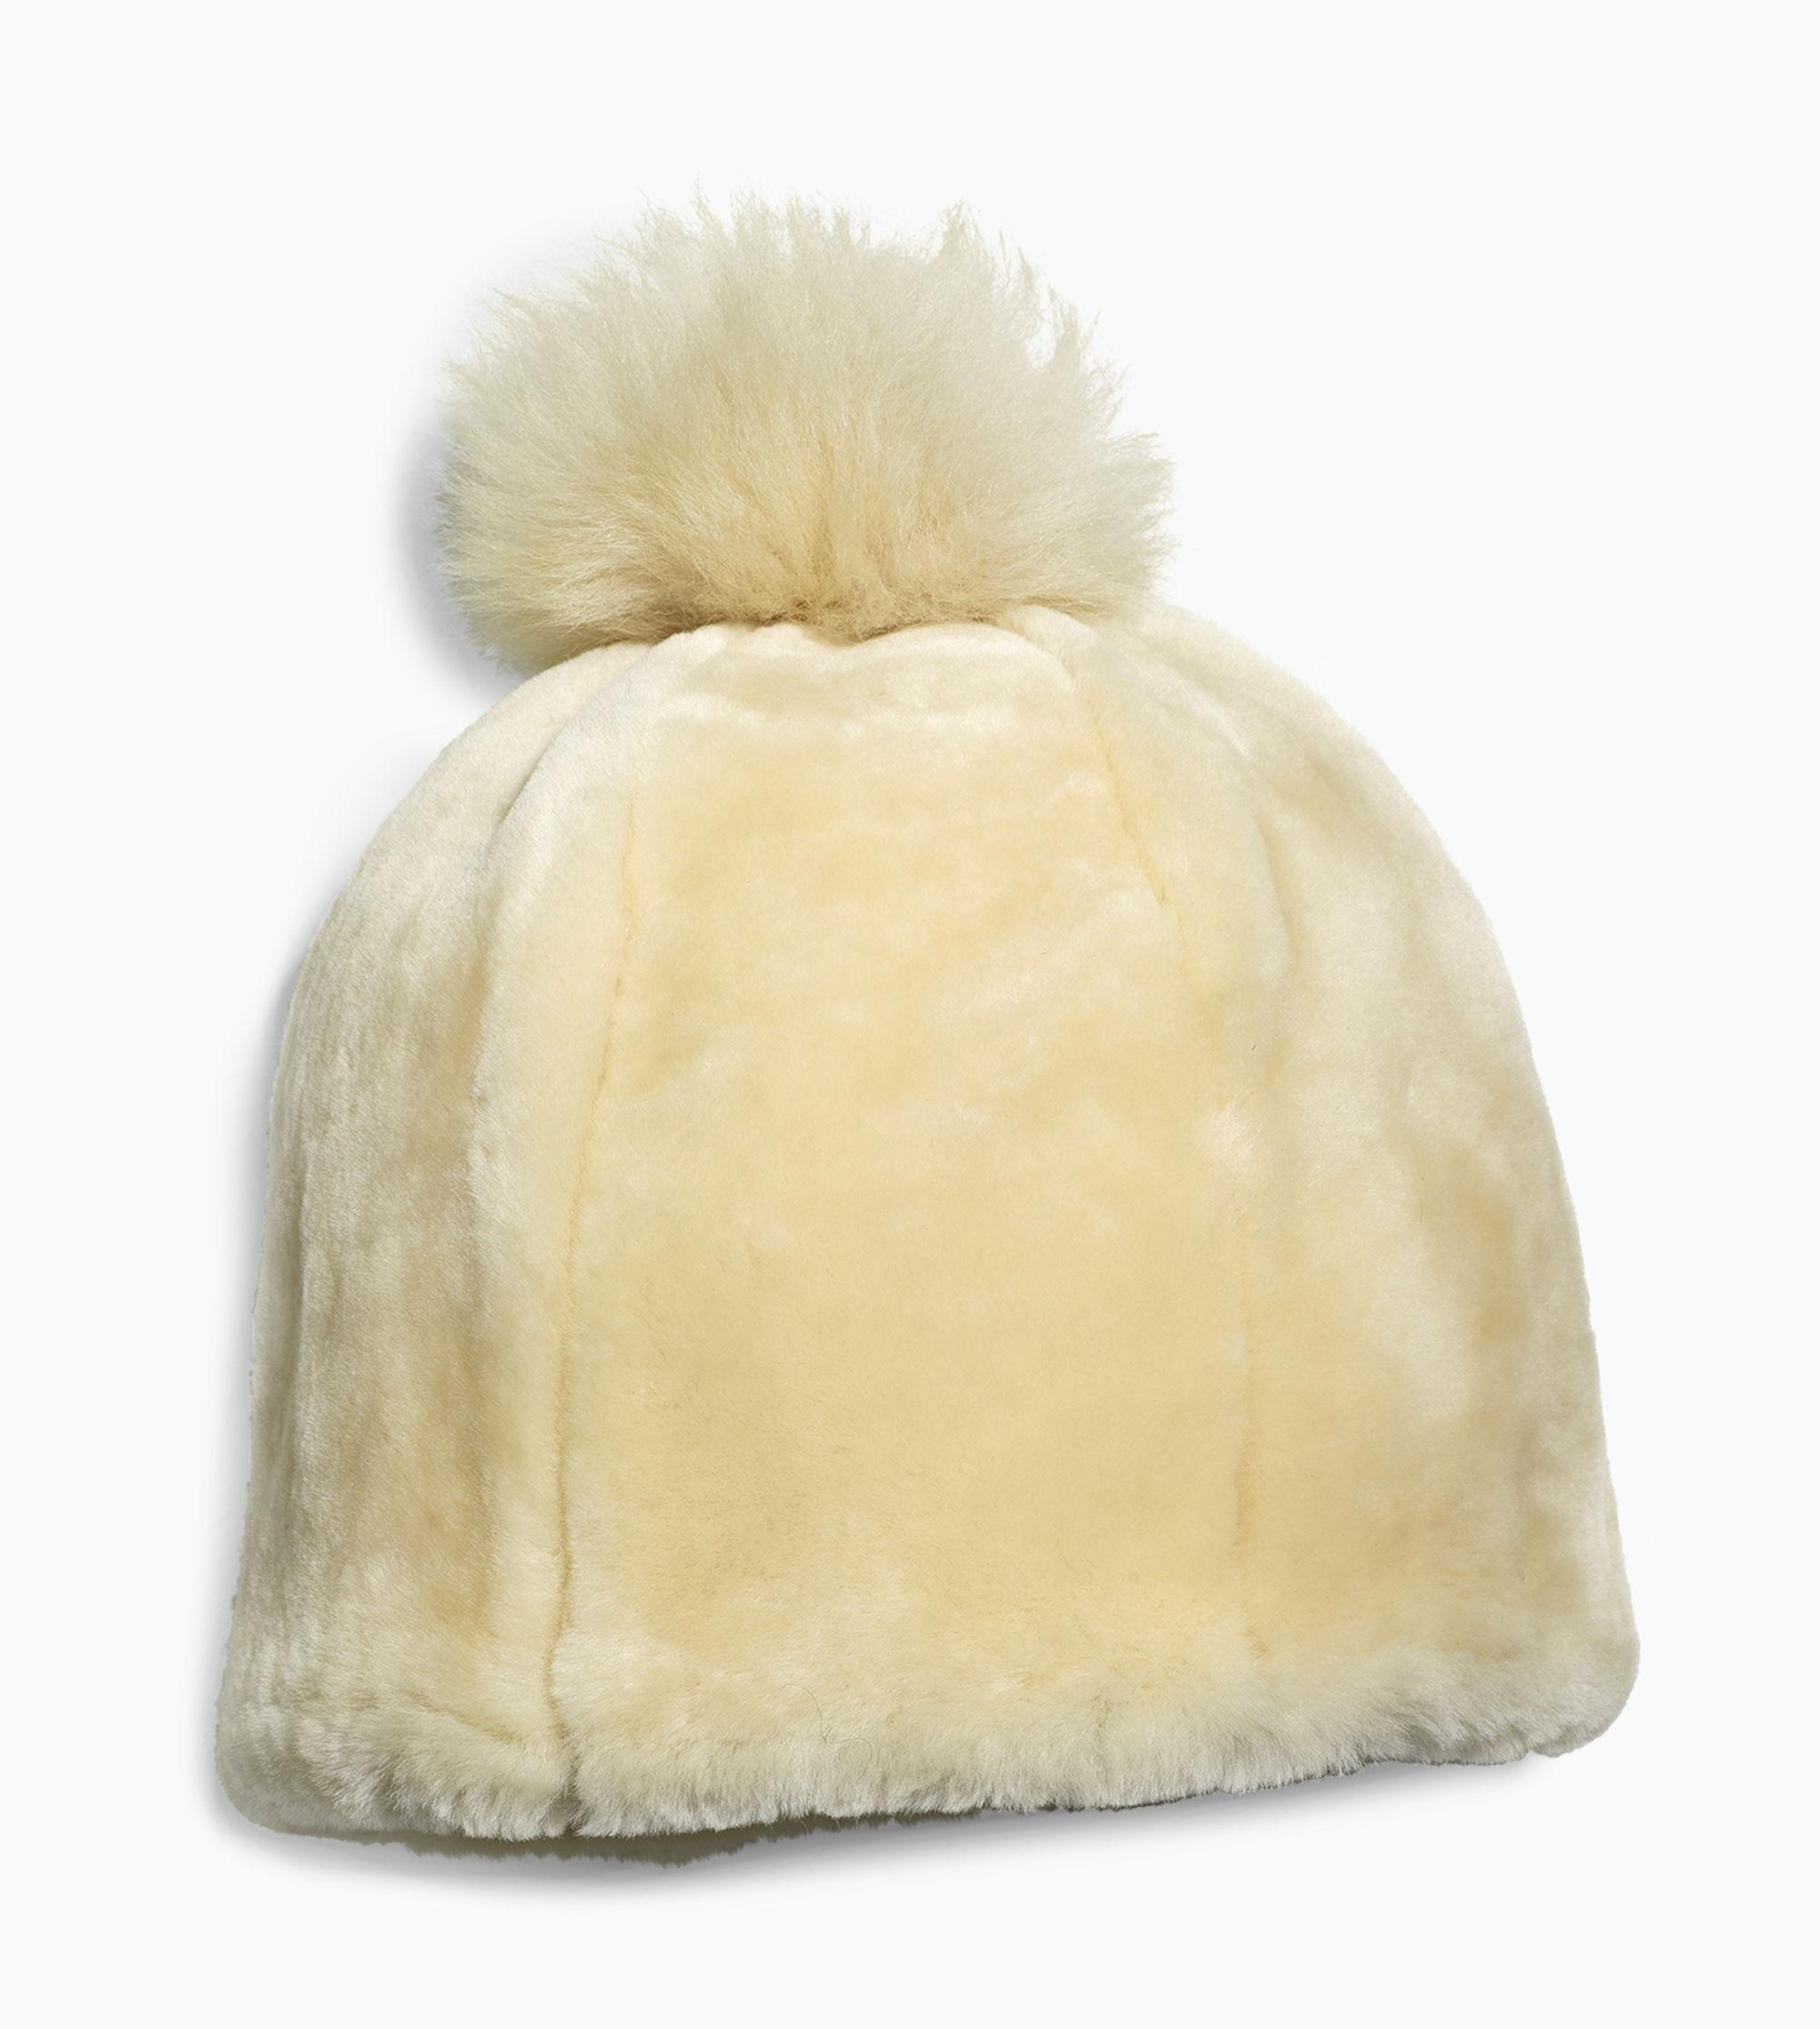 a3a4ba9f371 Lyst - UGG Solid Sheepskin Beanie Solid Sheepskin Beanie in Brown